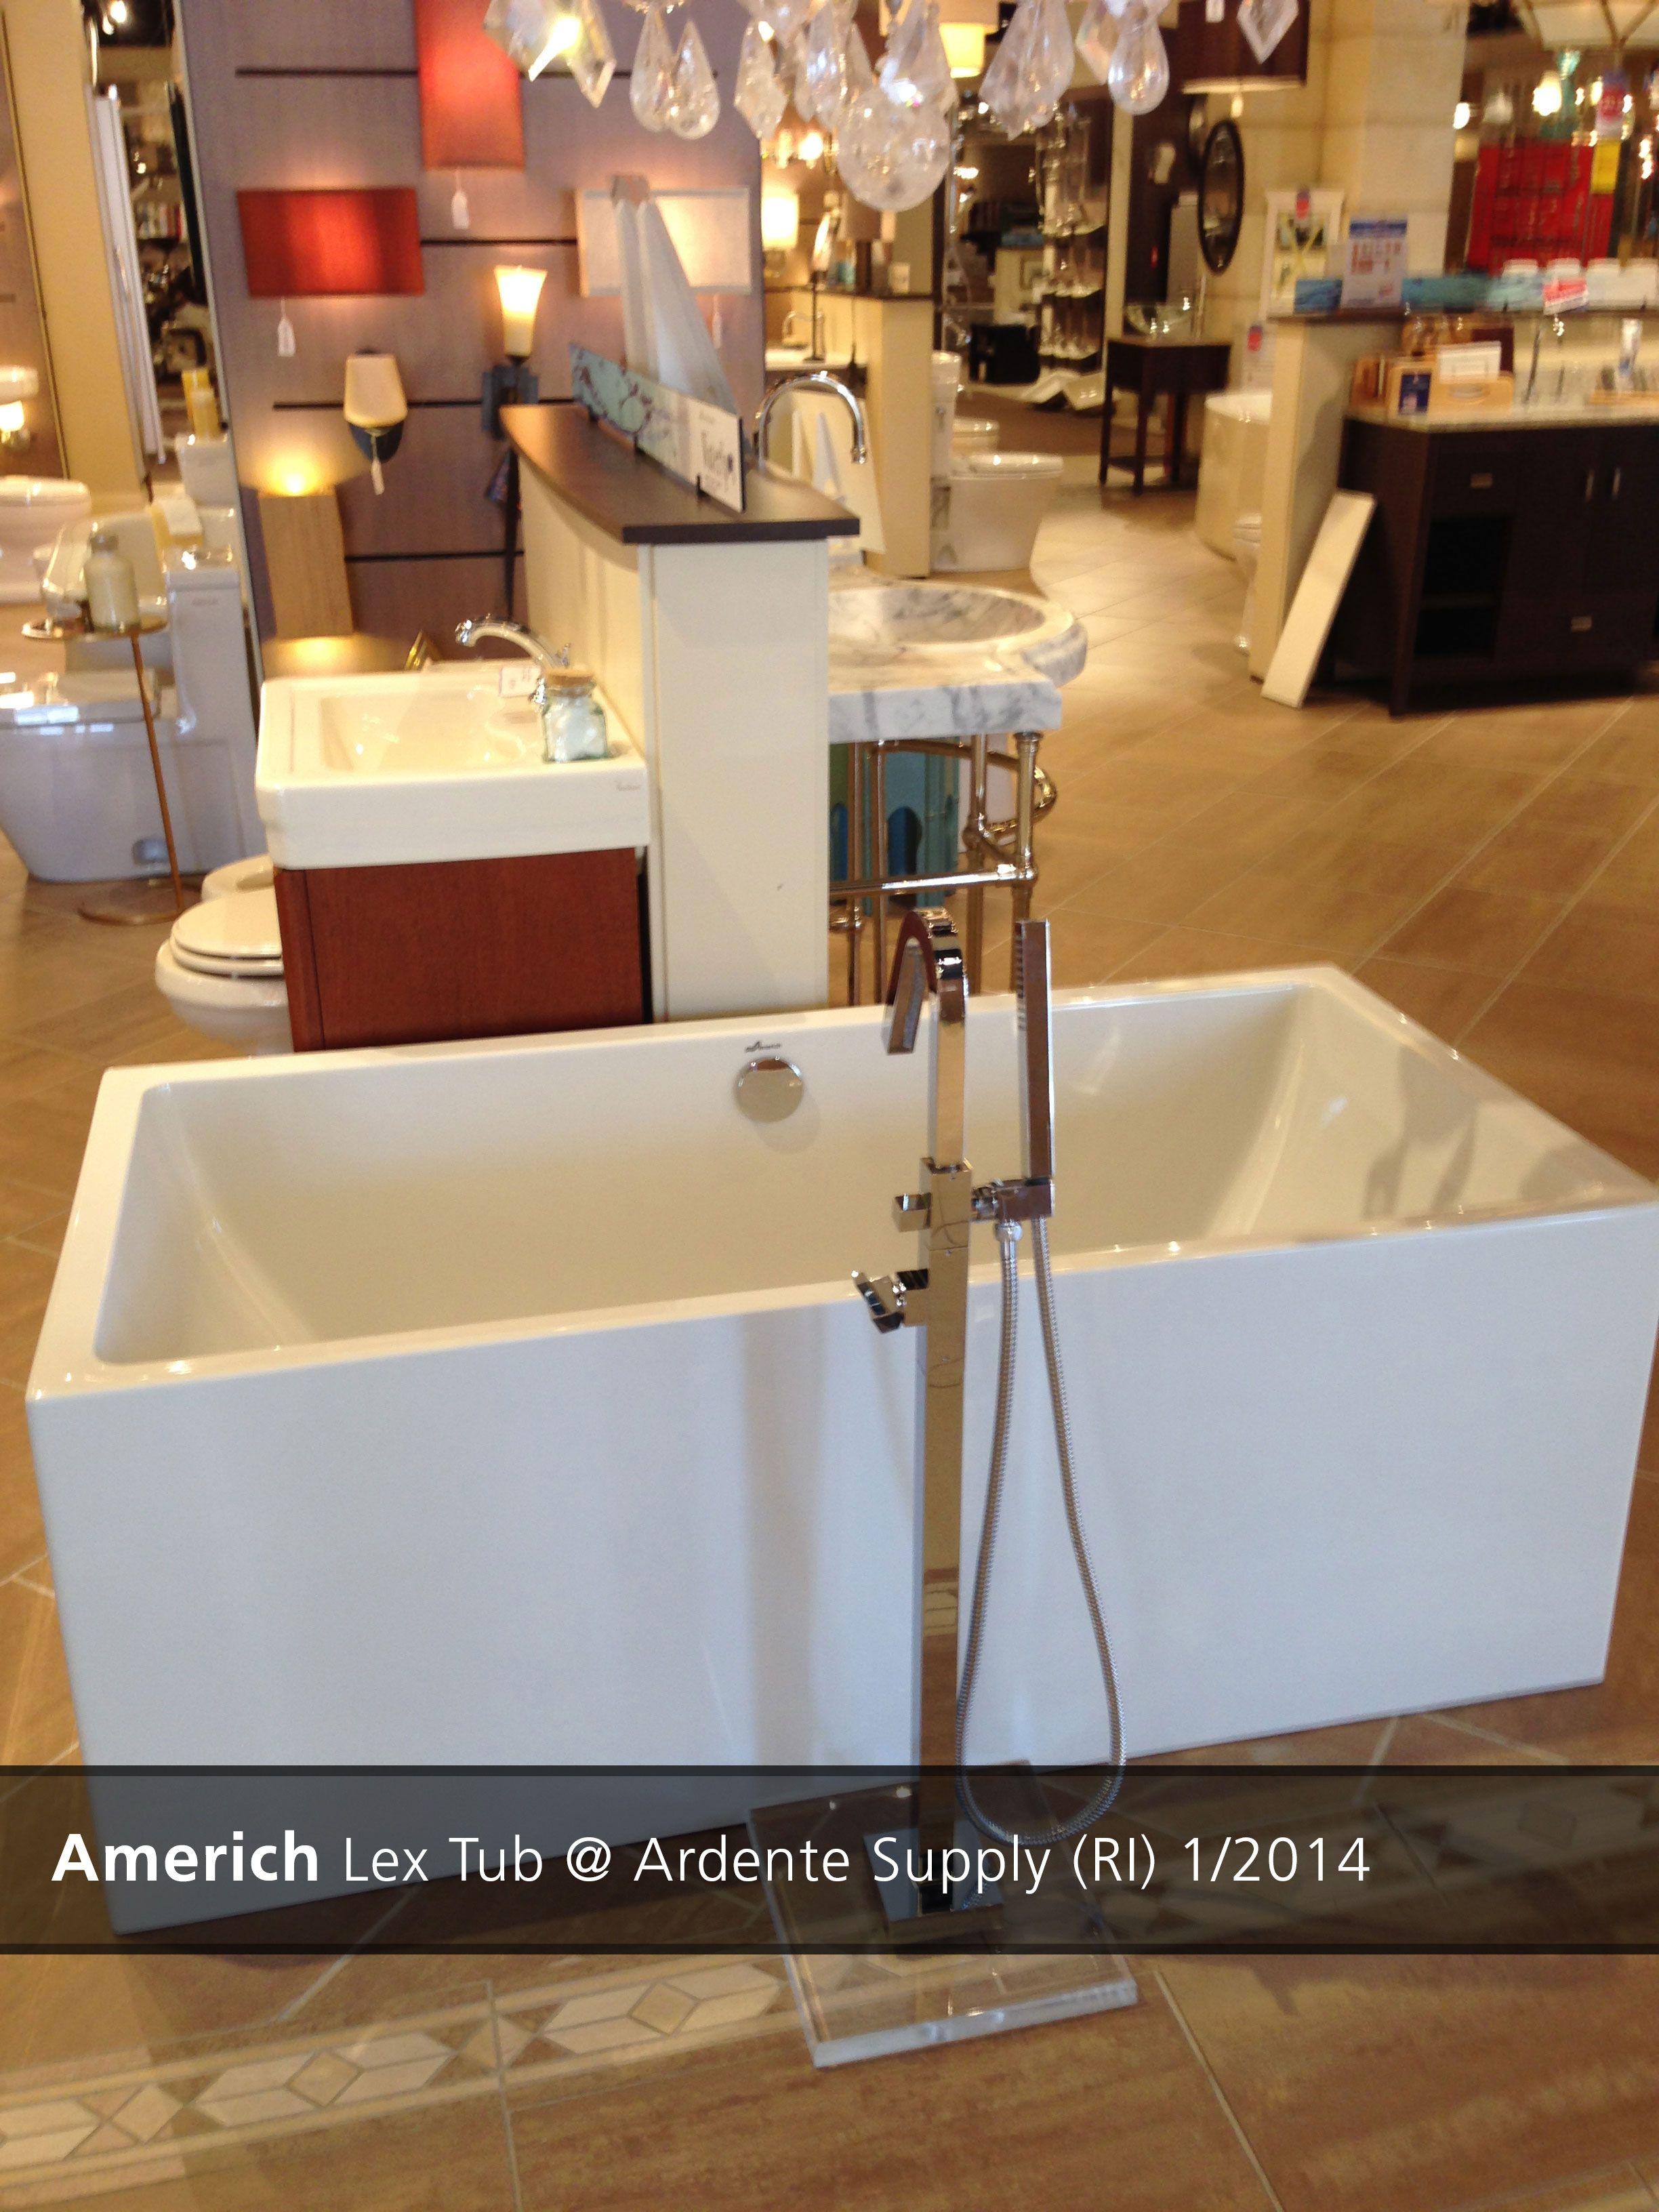 Americh Lex Tub Ardente Supply Ri 2014 Tub Showroom Display Showroom